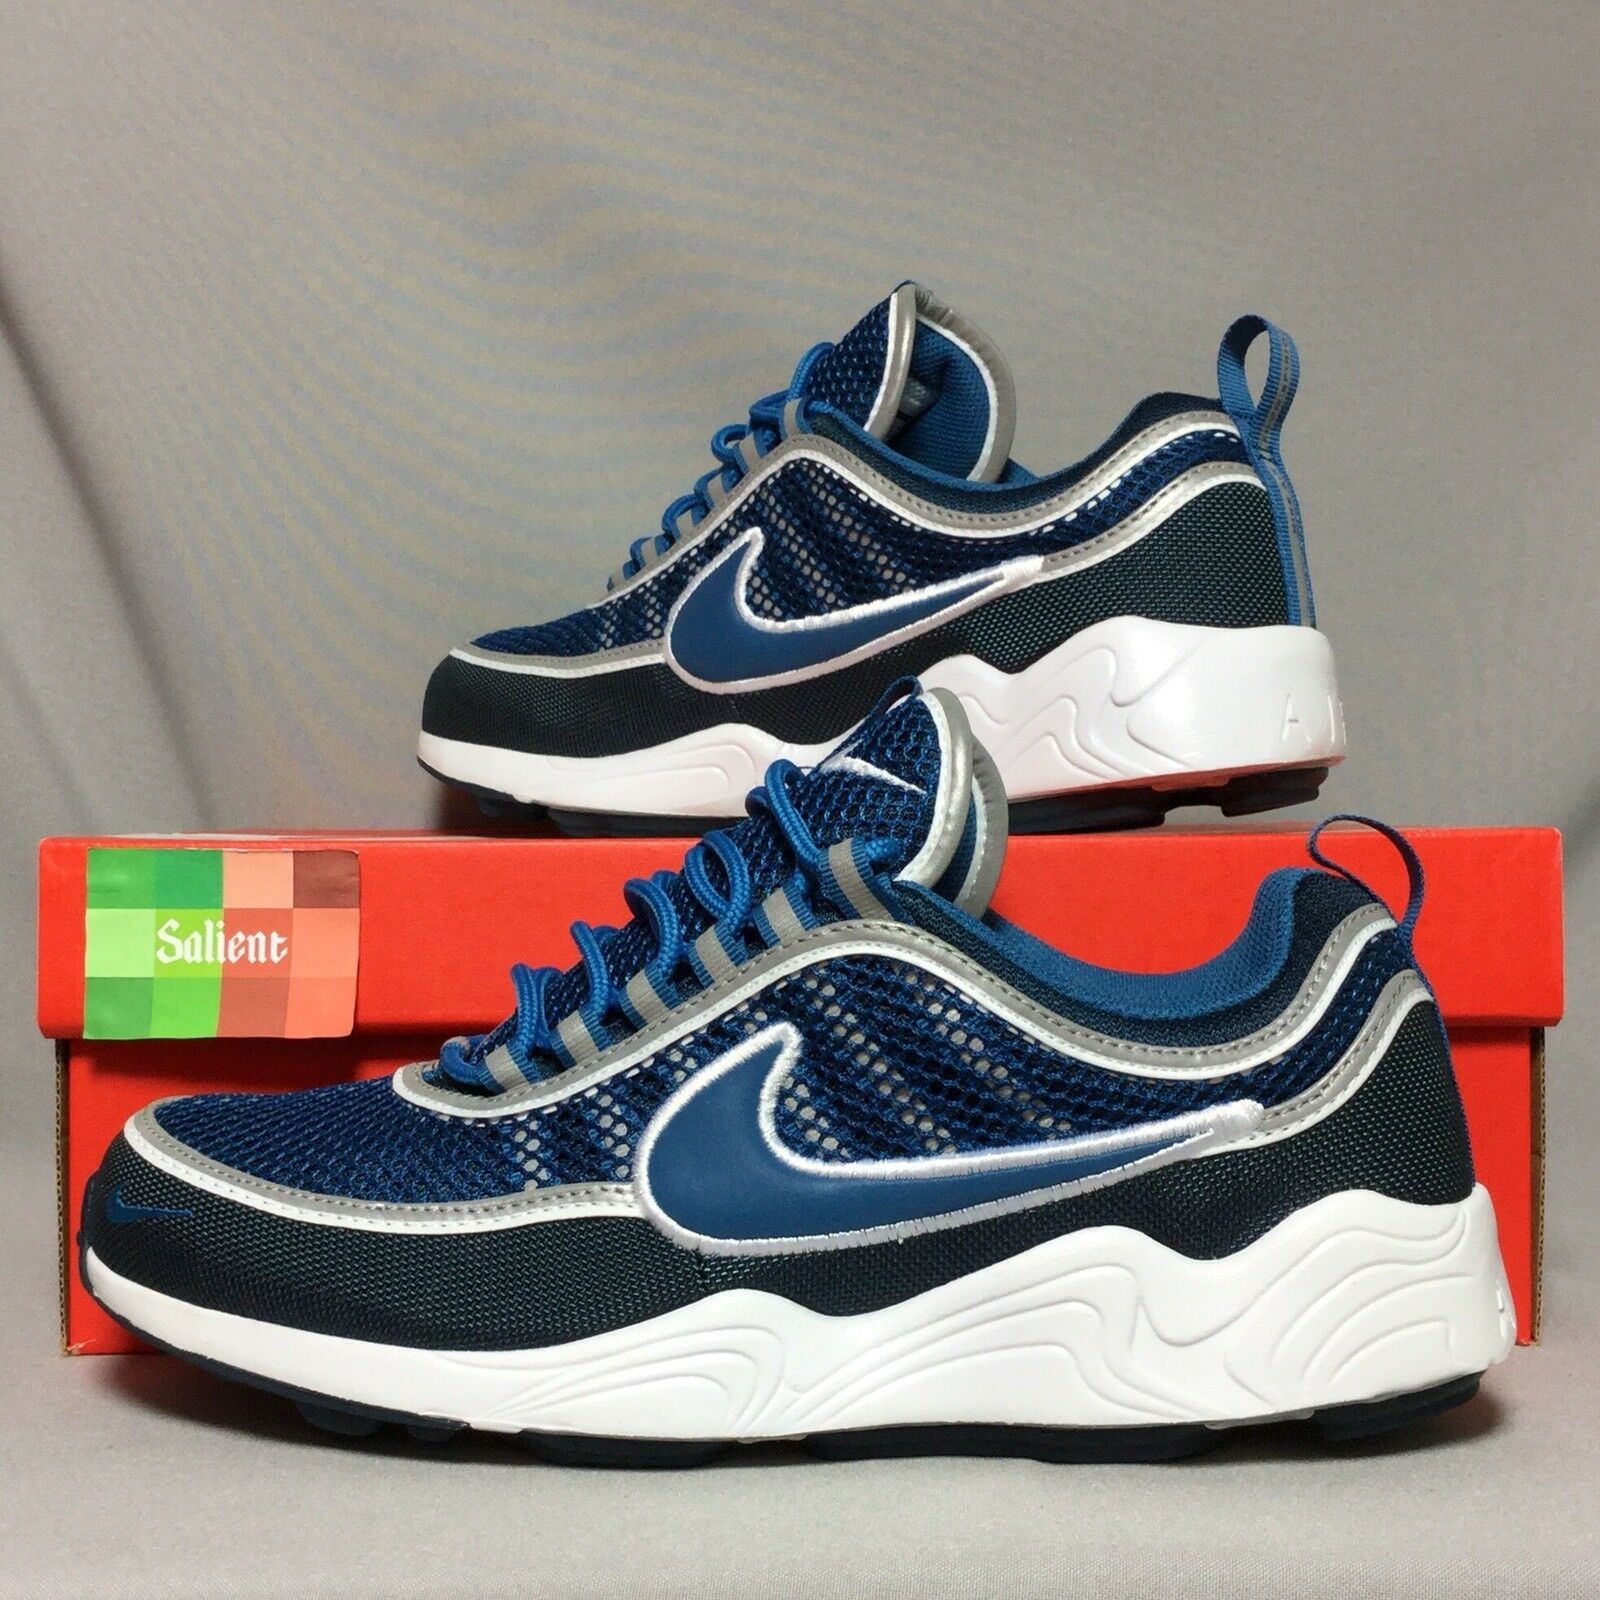 Nike Air Zoom Spiridon '16 UK8 926955-400 EUR42.5 US9 Armory Navy White Blue 16